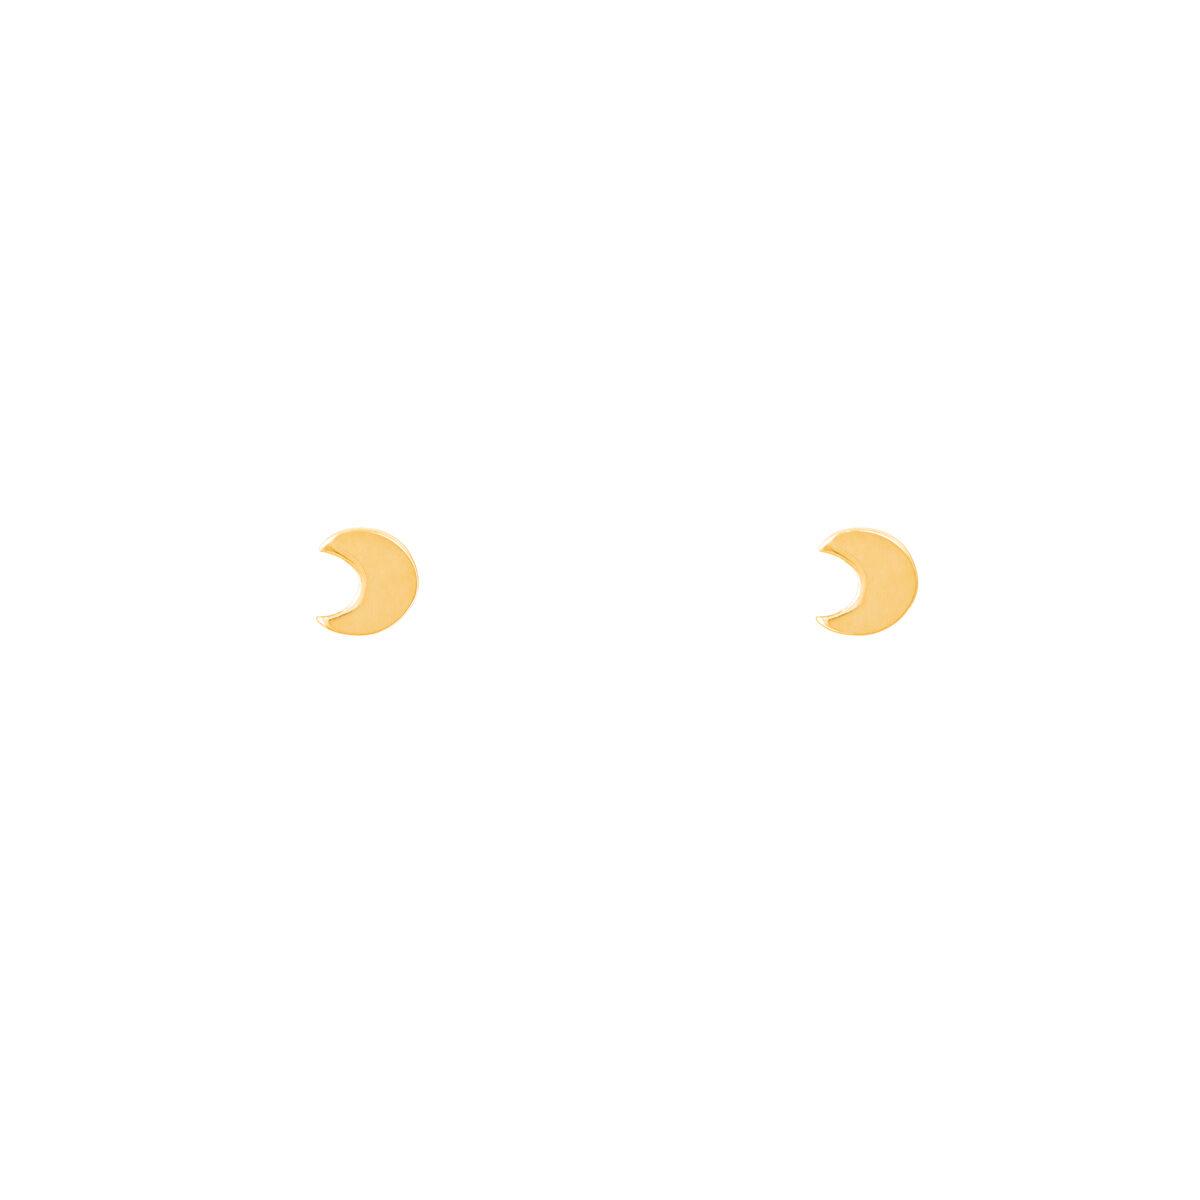 گوشواره طلا ماه کوچک |parasteh